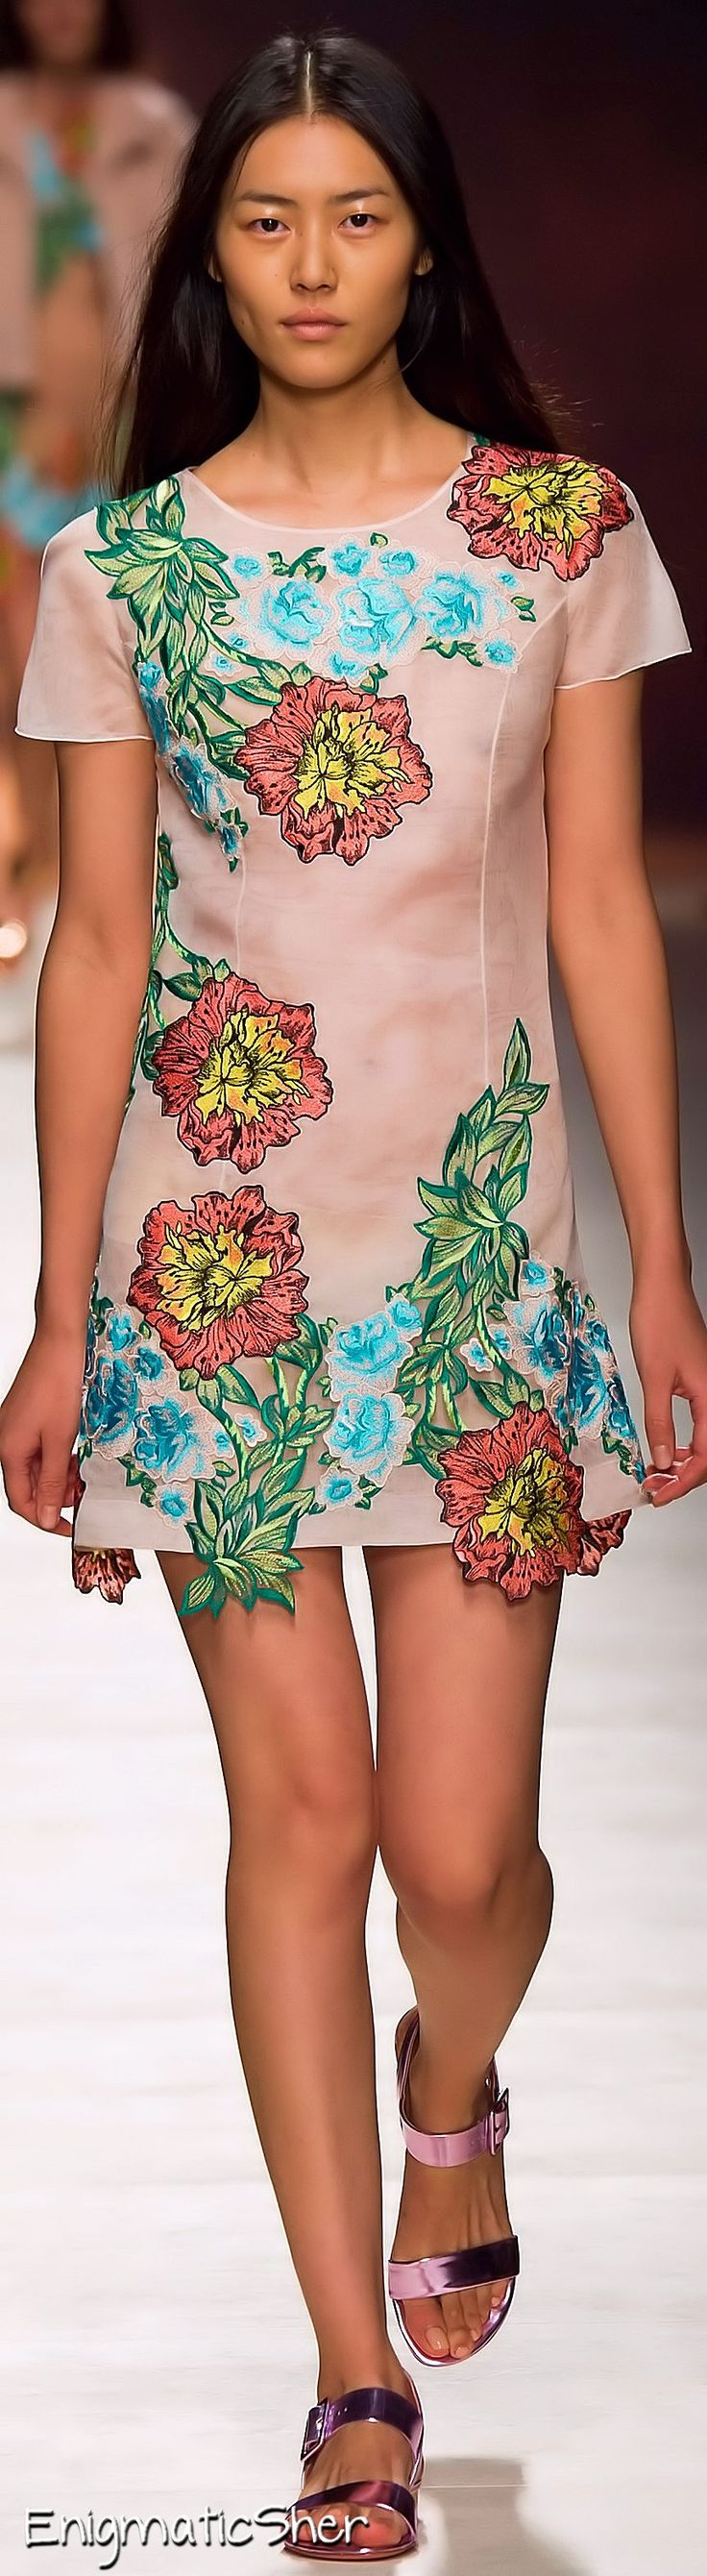 Blumarine Spring Summer 2015 Ready-To-Wear